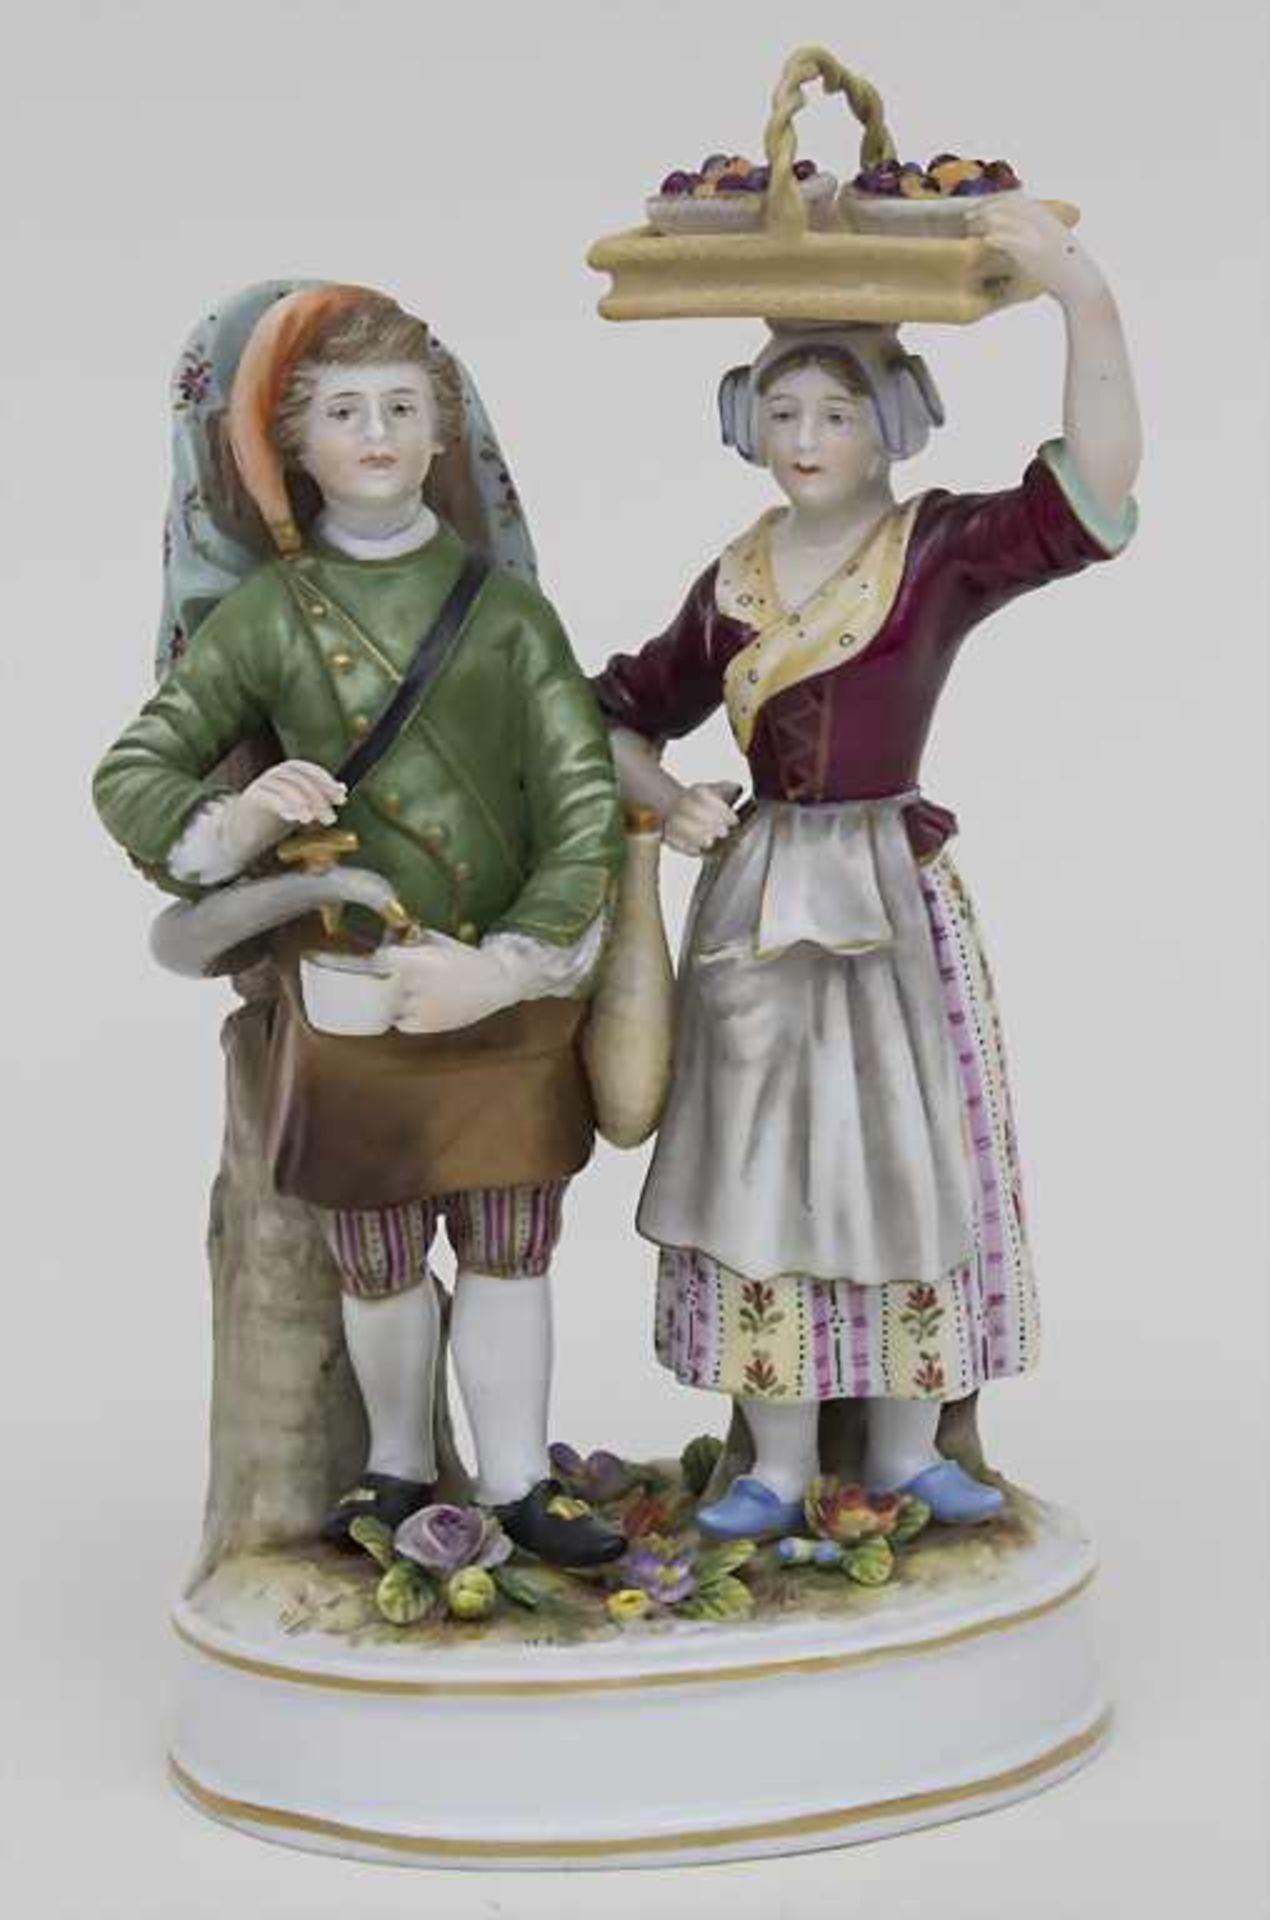 Figurengruppe 'Marktverkäufer' / A figural group 'market sellers', Volkstedt-Rudolstadt, um 1900